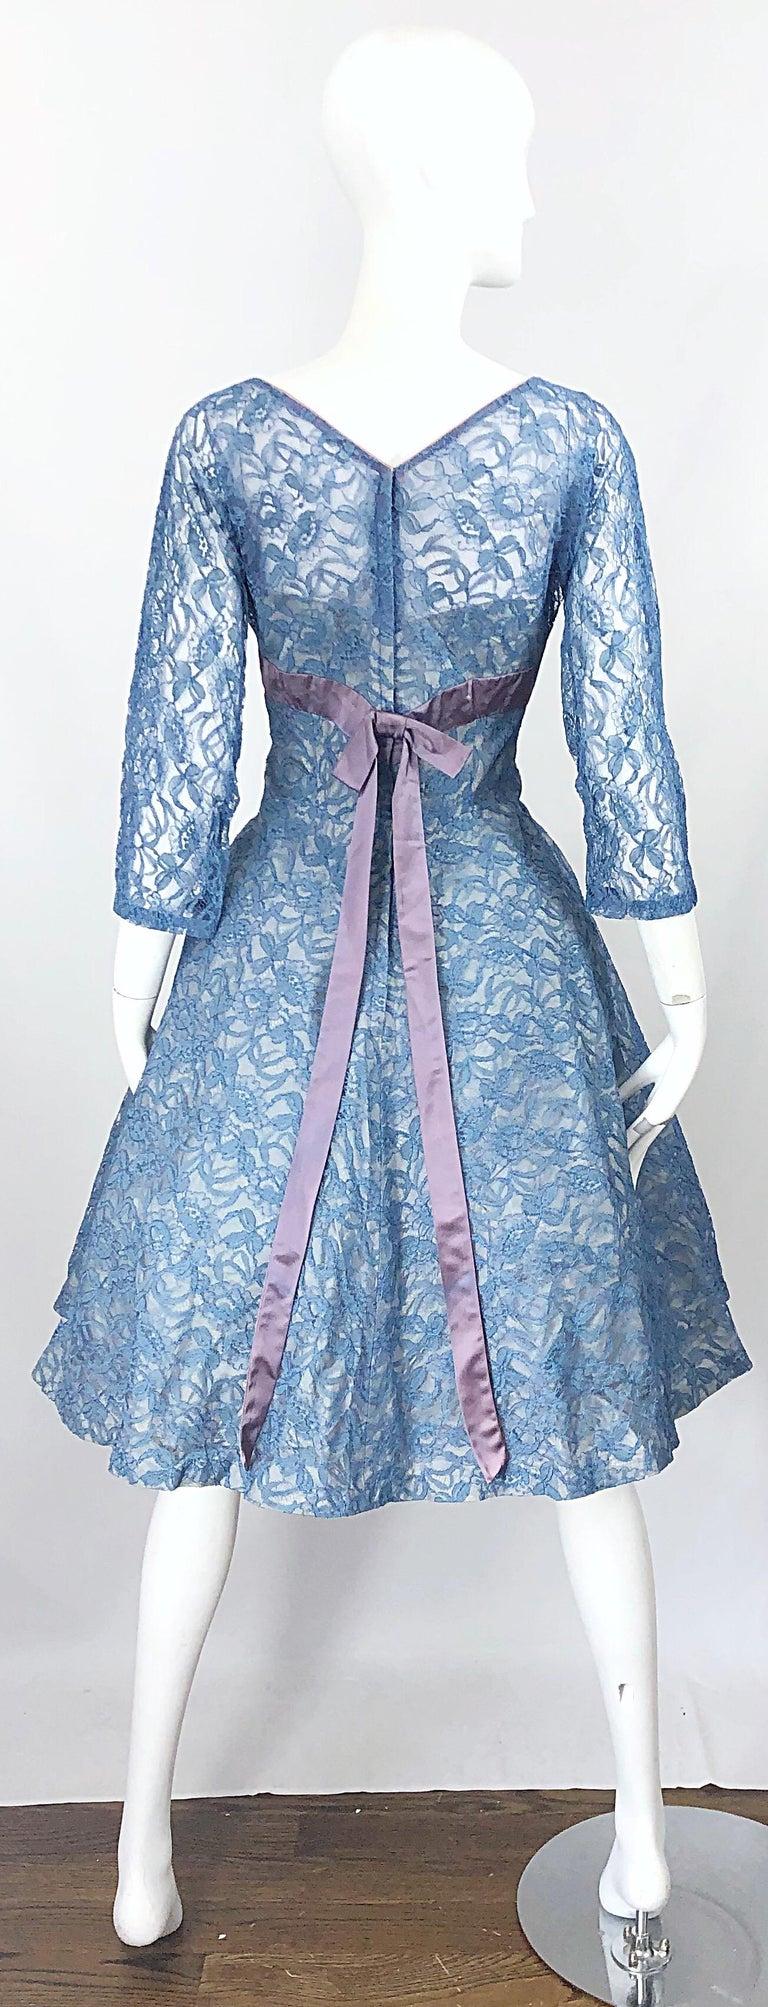 1950s Demi Couture Periwinkle Blue Chantily Lace Fit n' Flare Vintage 50s Dress For Sale 8